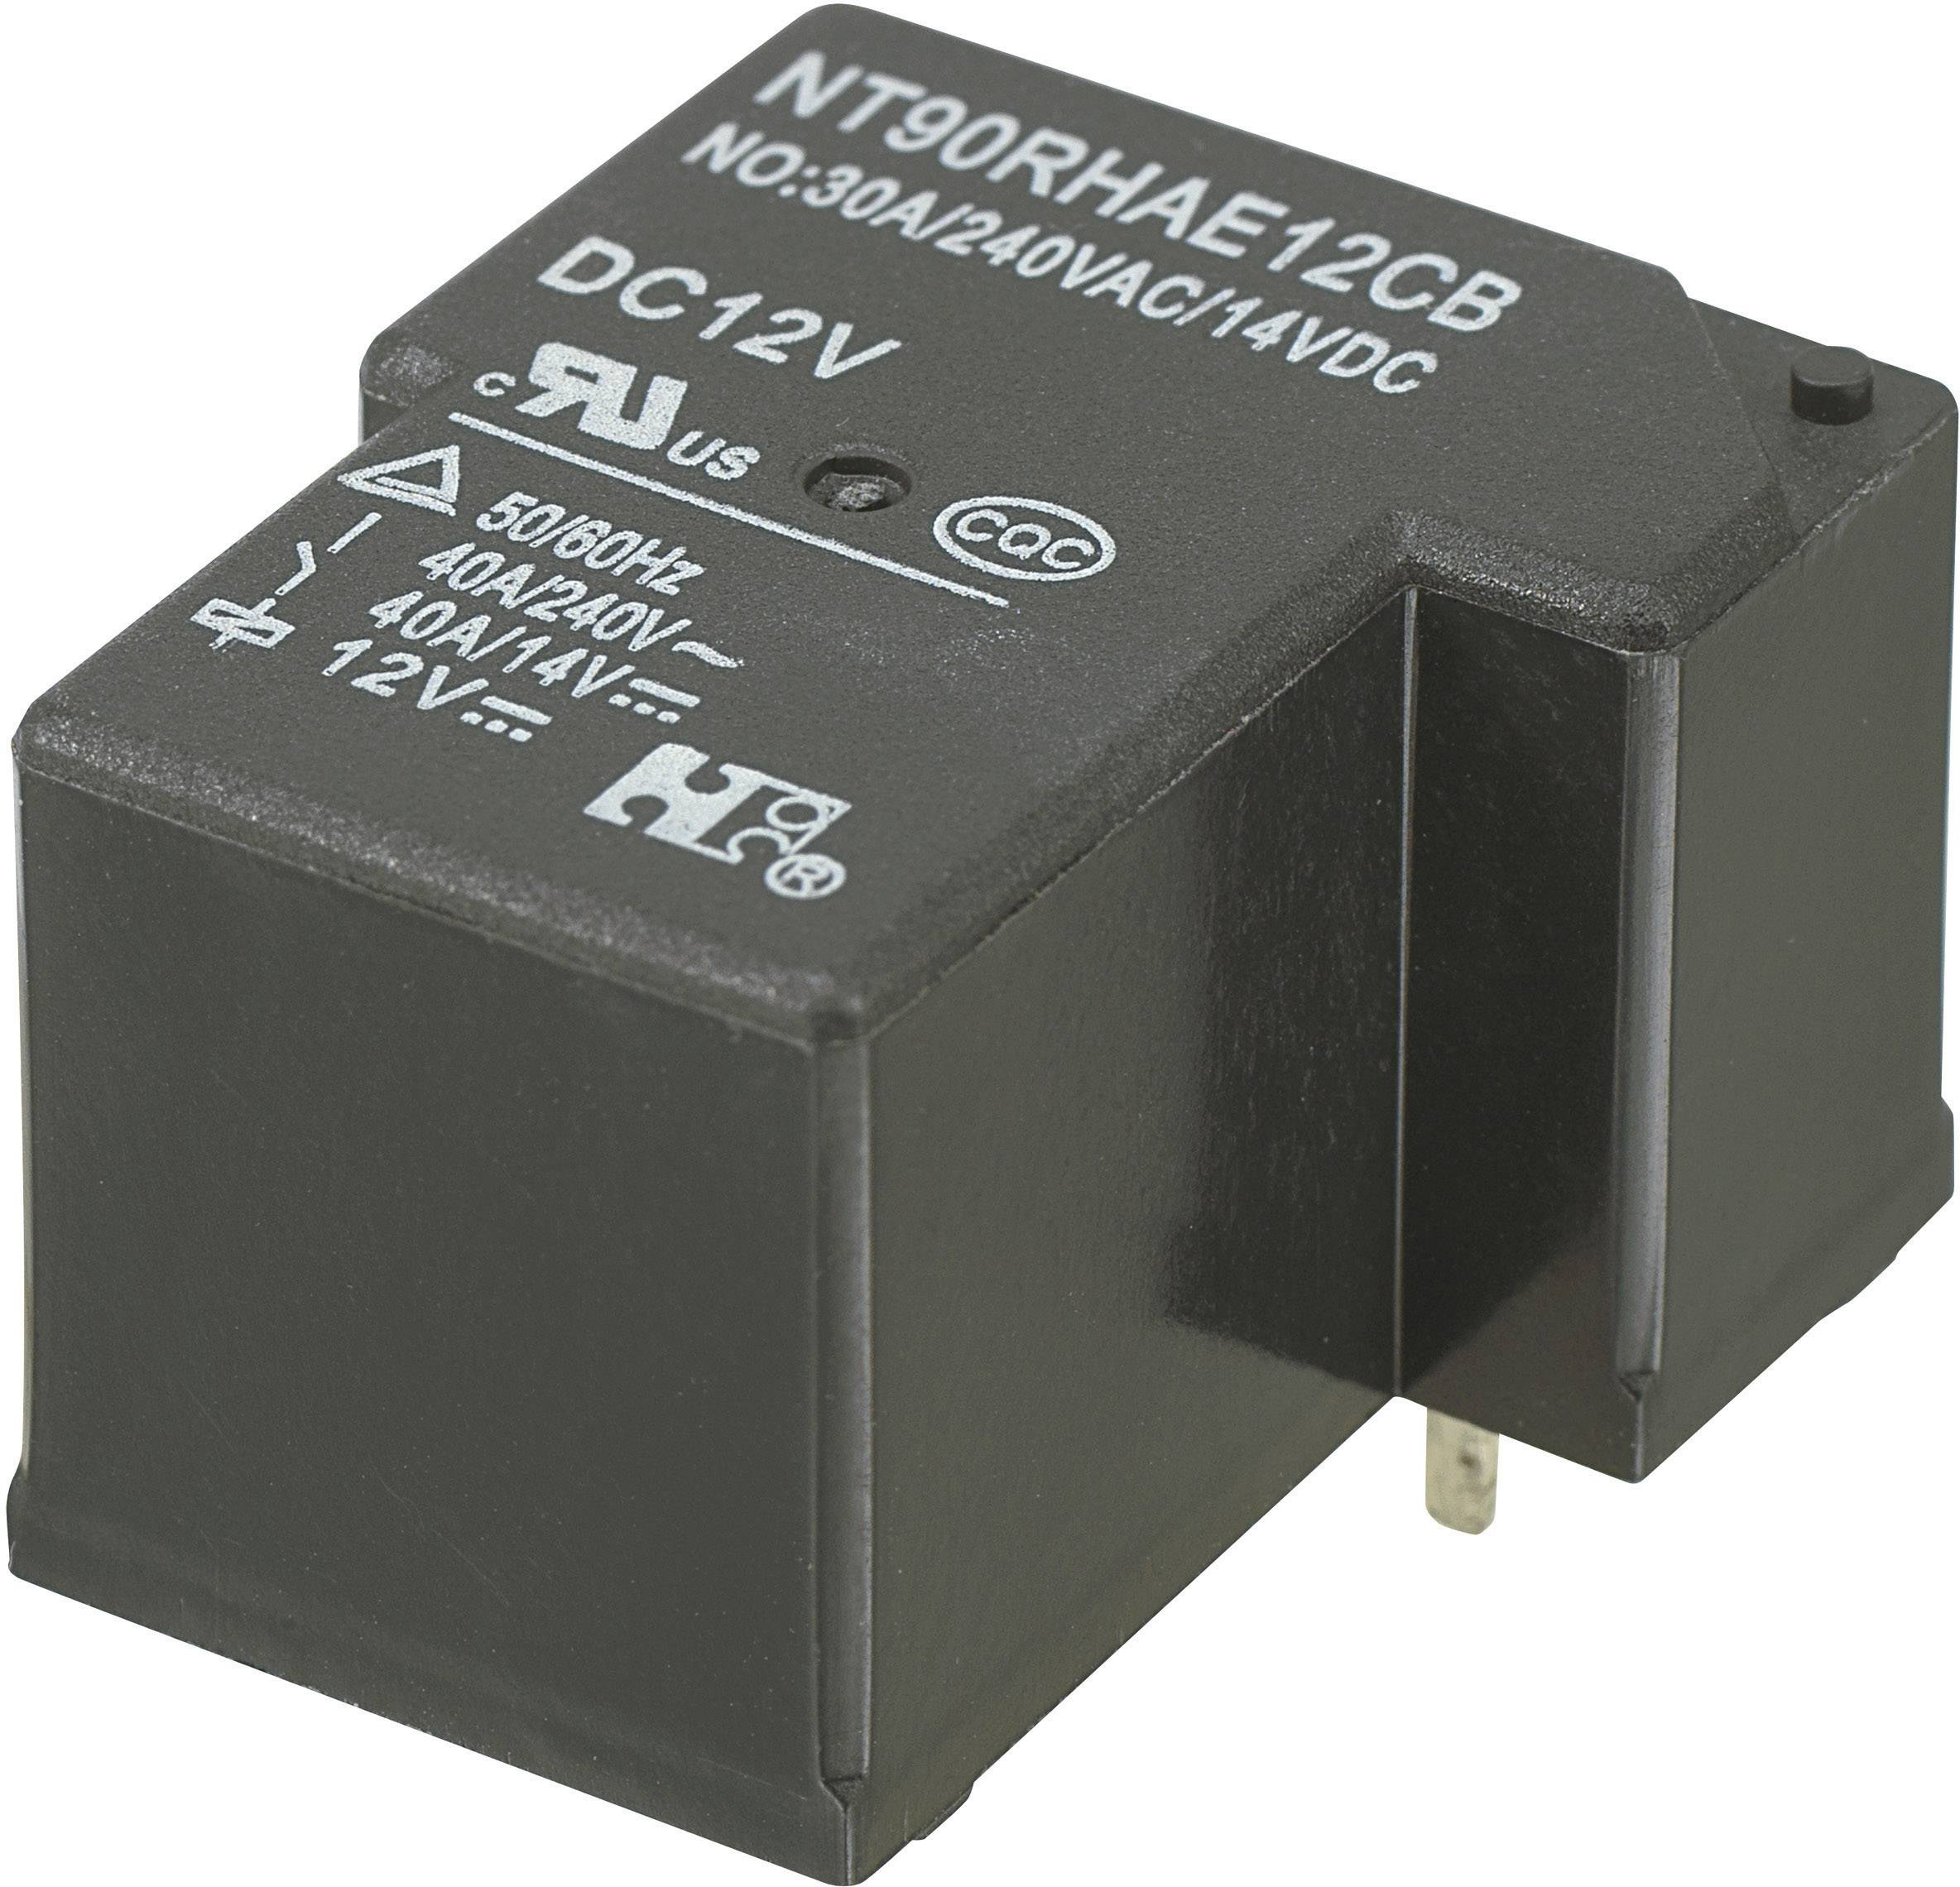 HATF905ASDC12 Power Relay 50A 240VAC 4 Pins x 10pcs